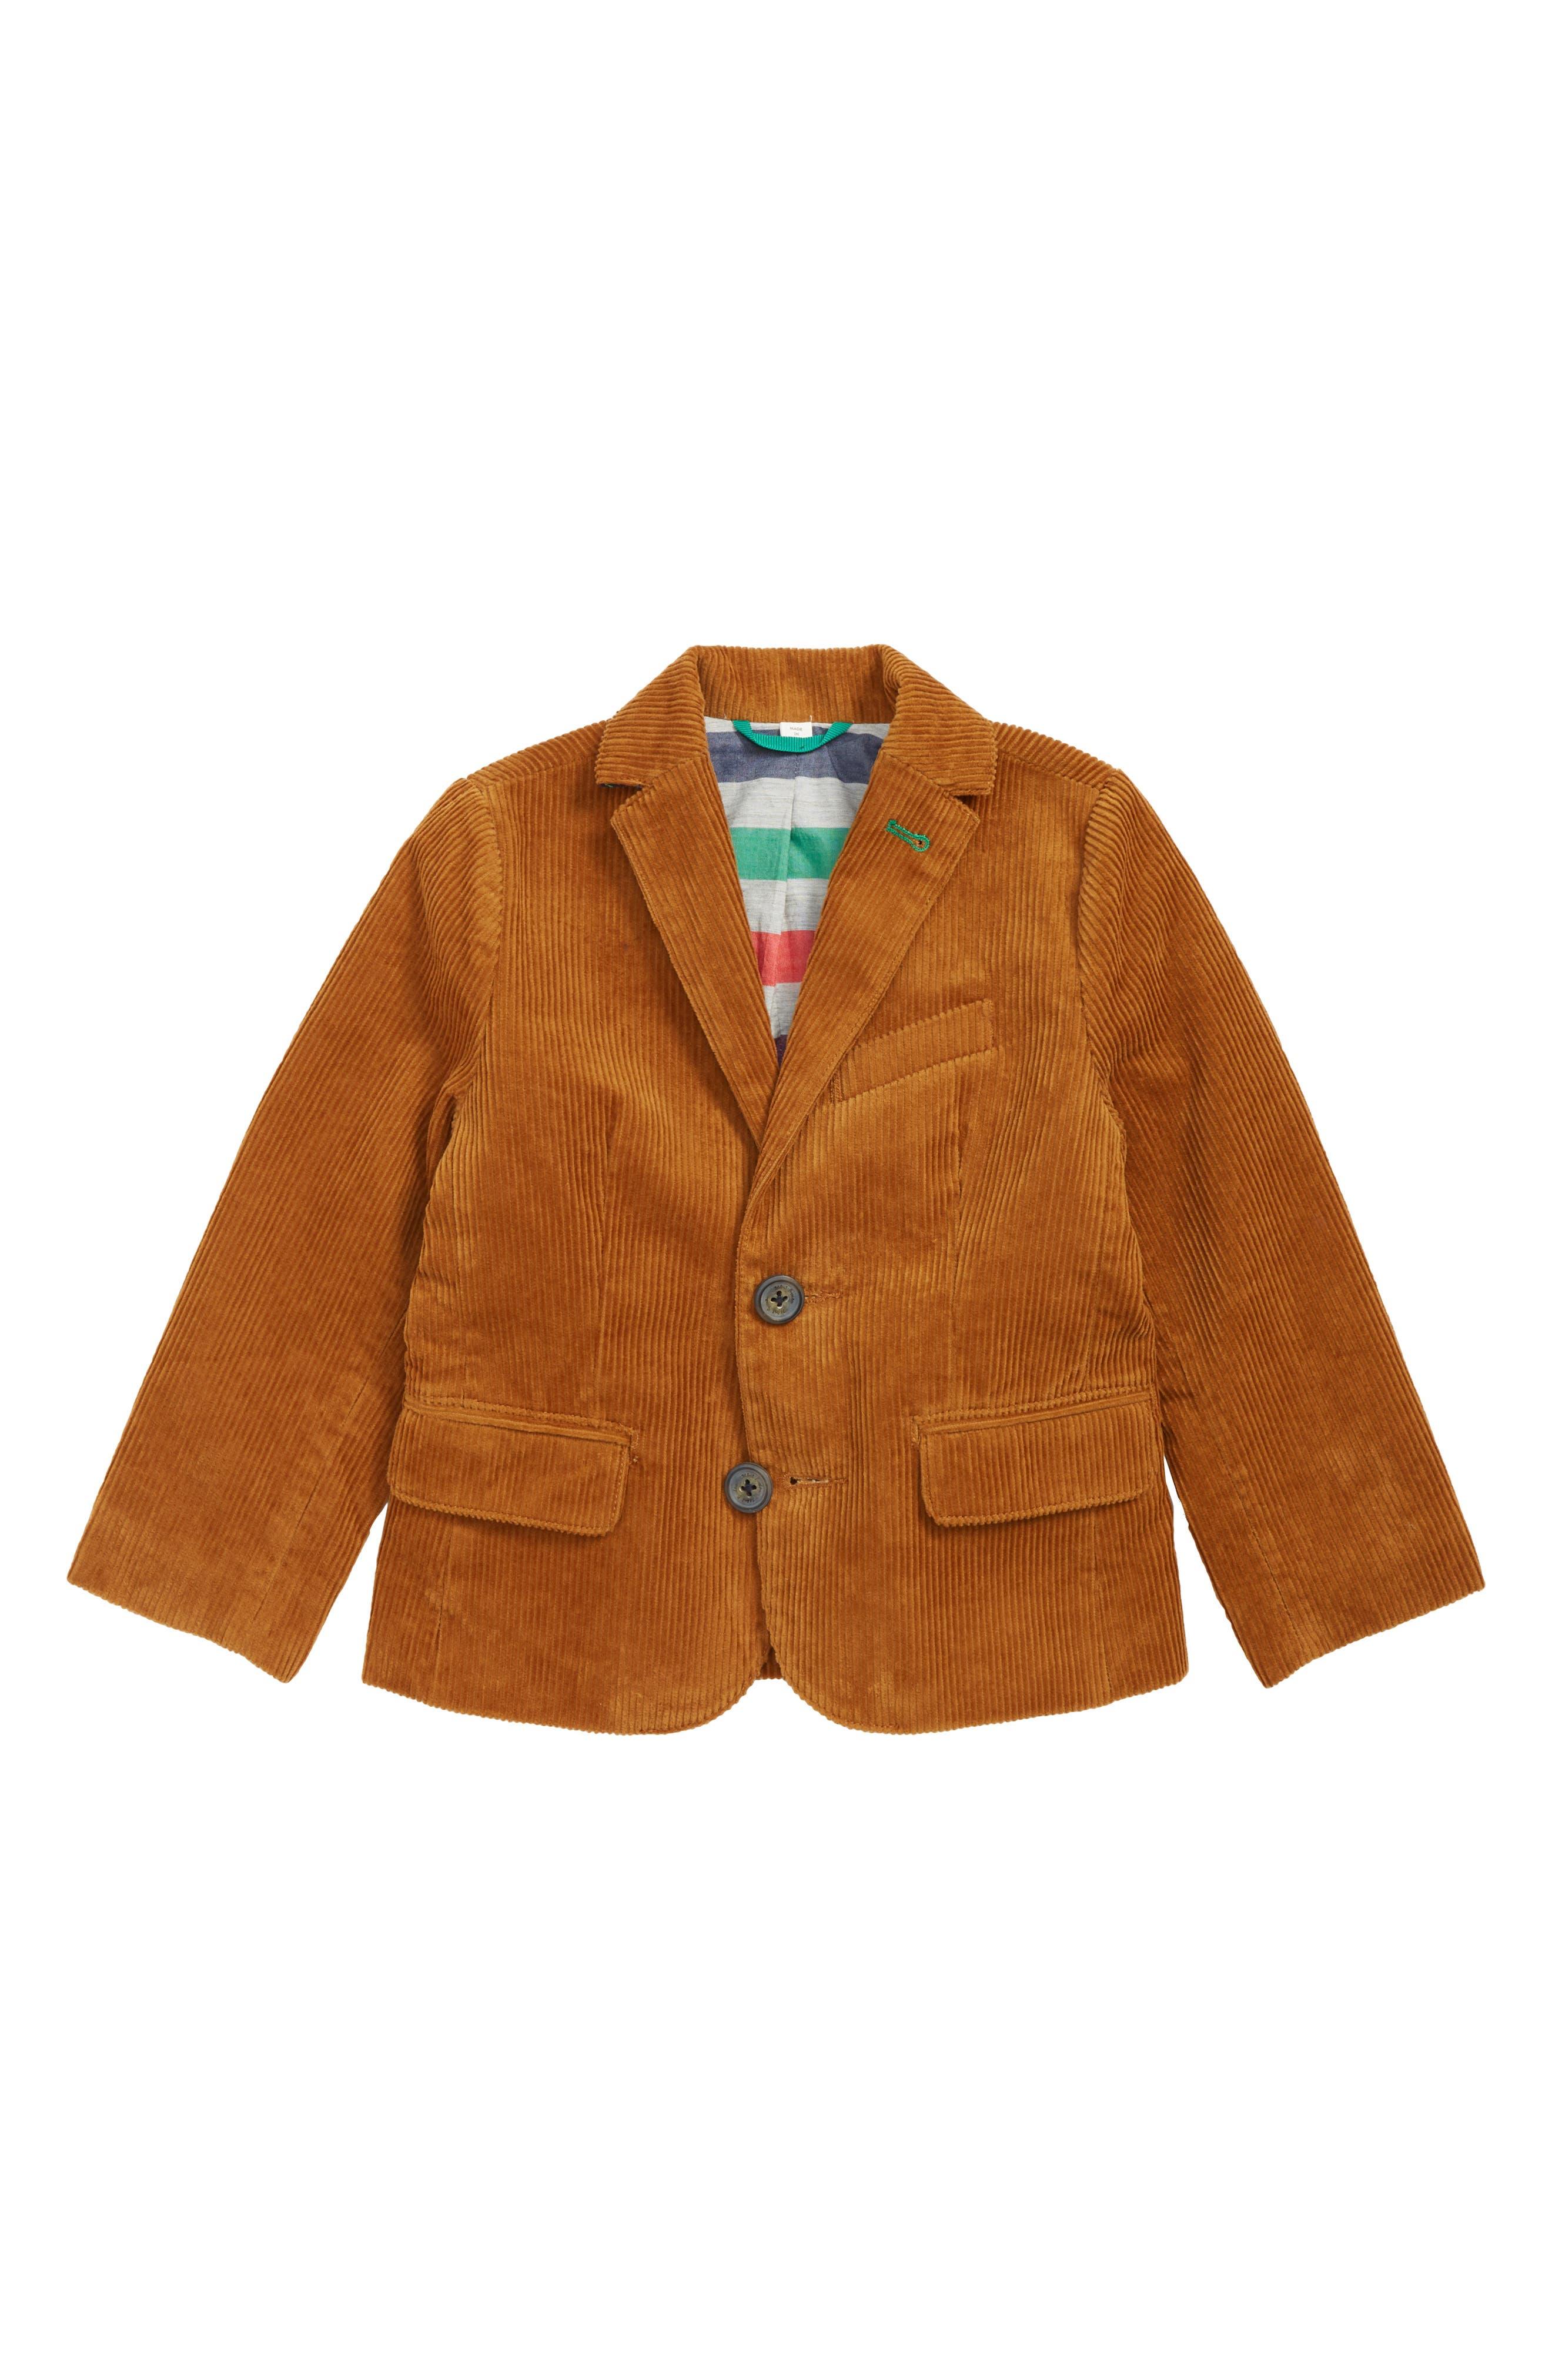 Boys Mini Boden Corduroy Blazer Size 45Y  Brown